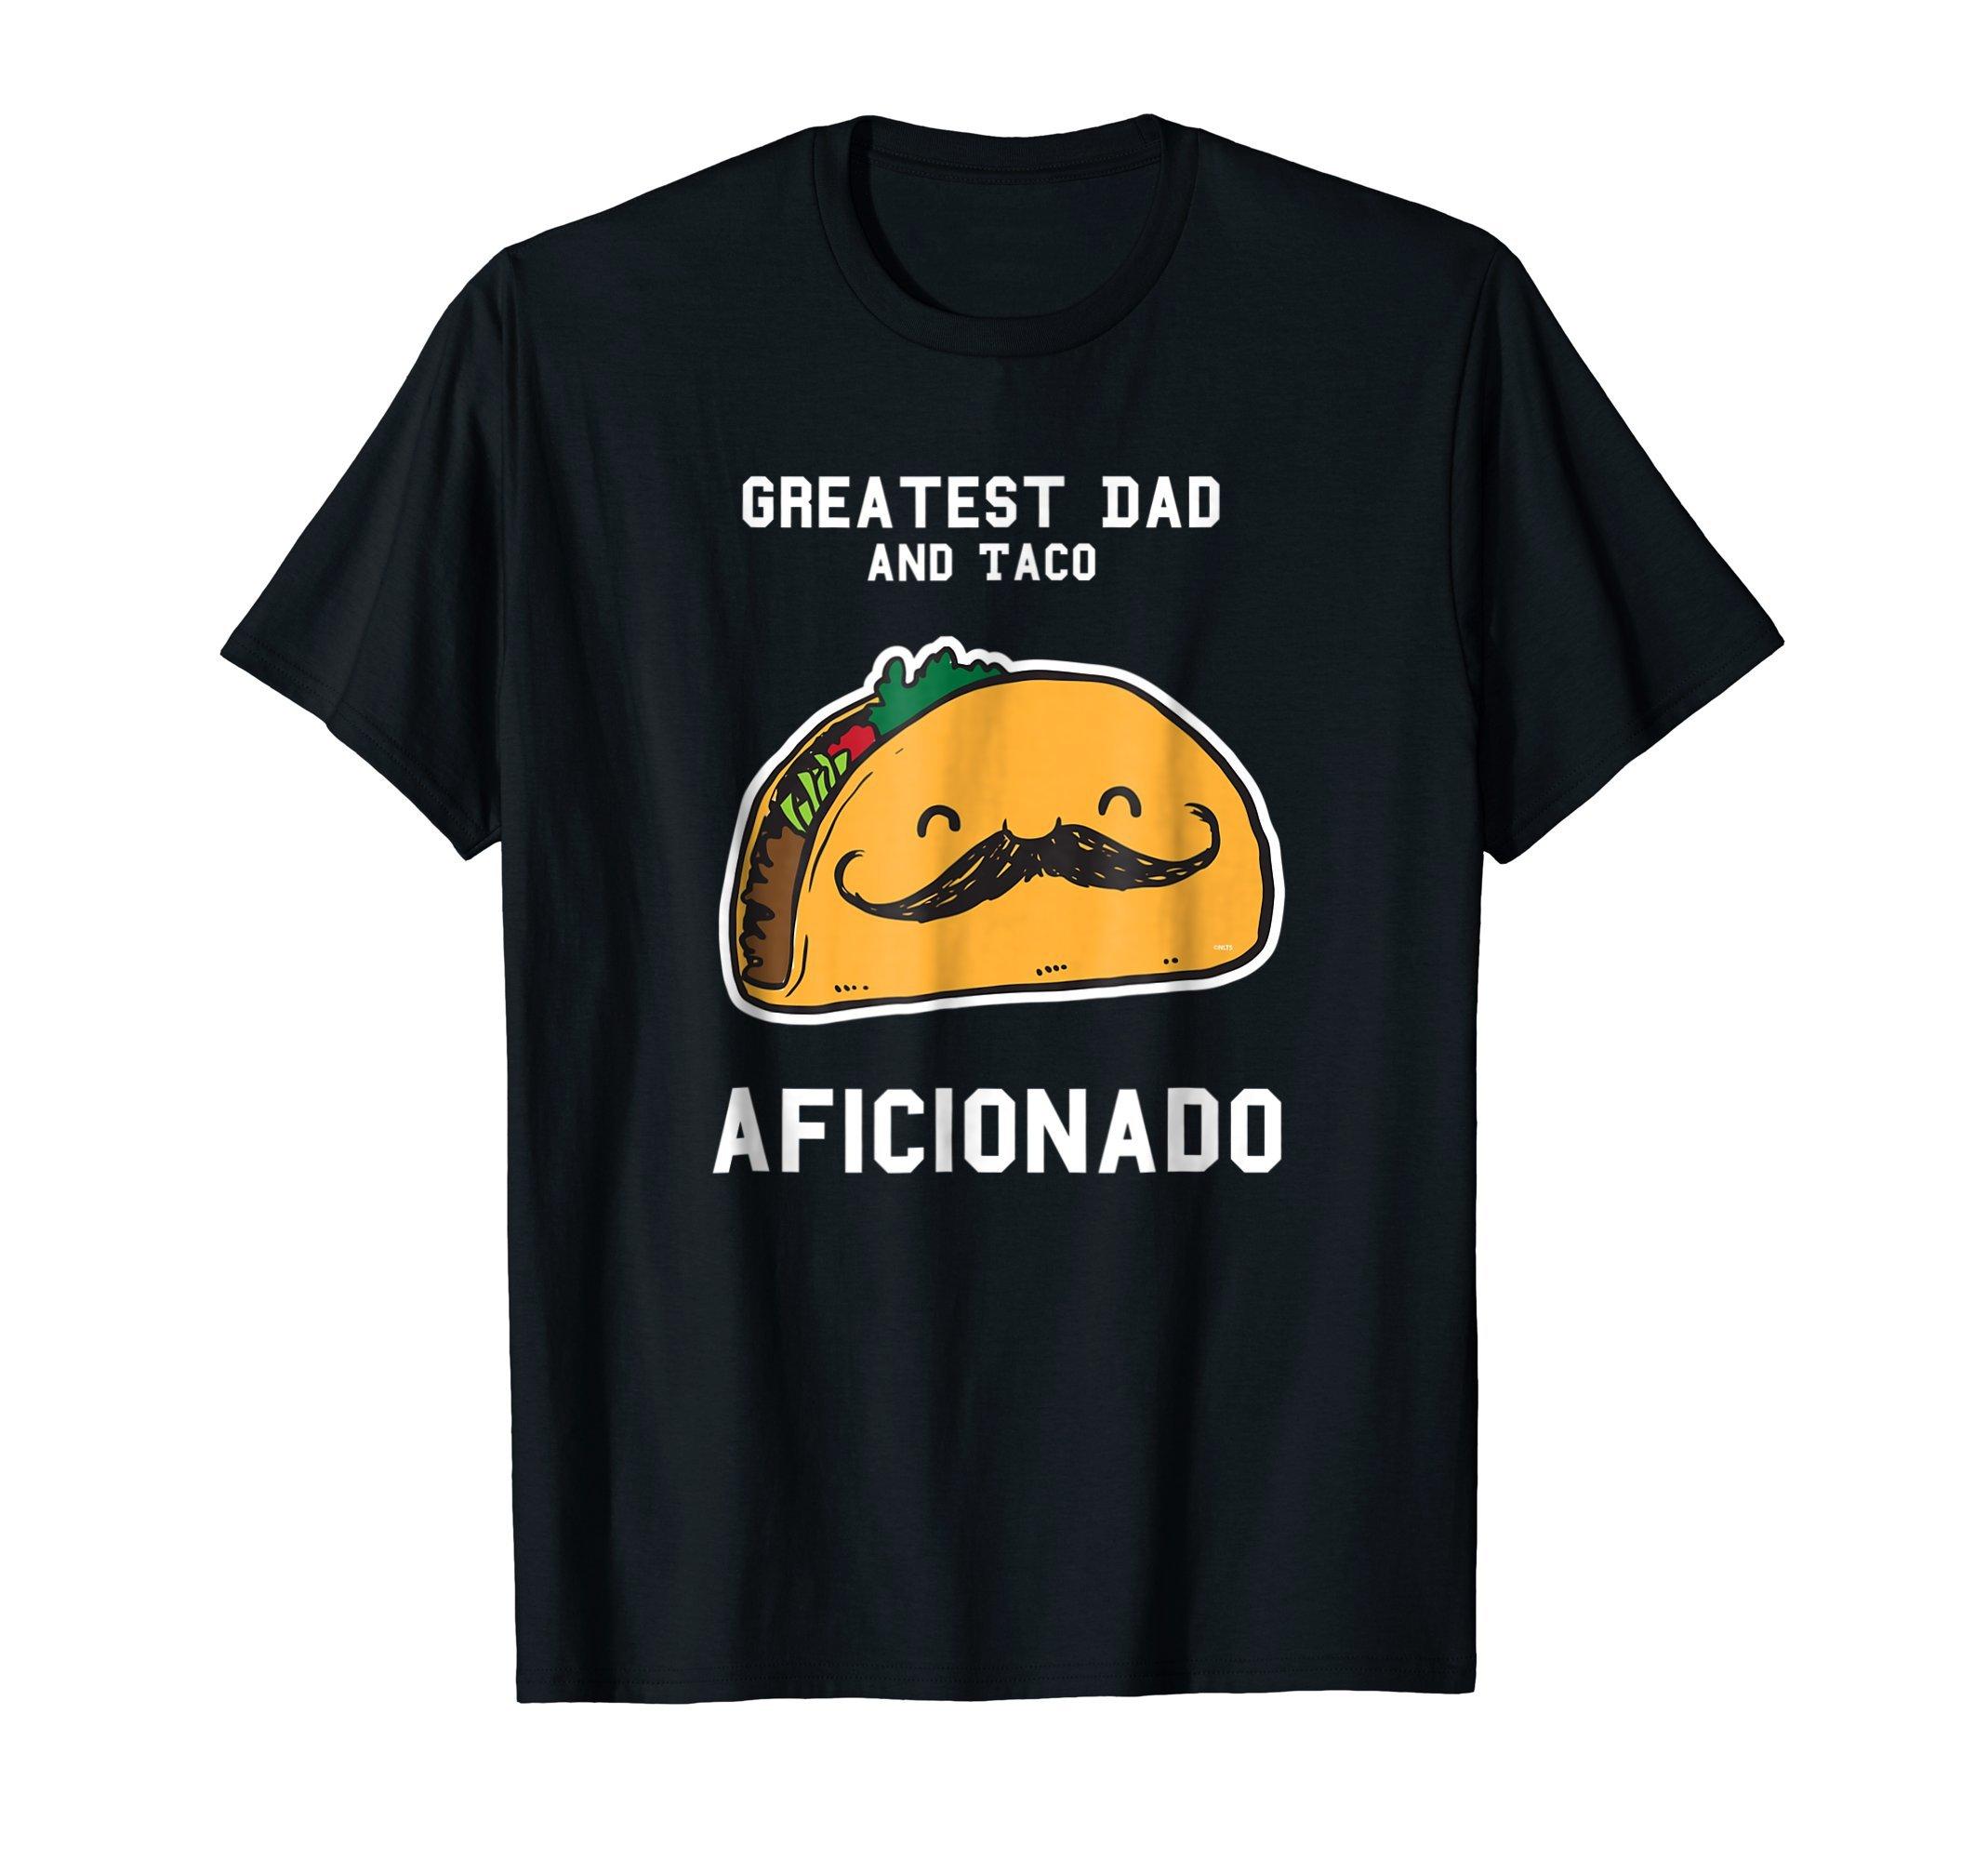 Greatest-Dad-and-Taco-Aficionado-T-Shirt-Fathers-Day-Tee